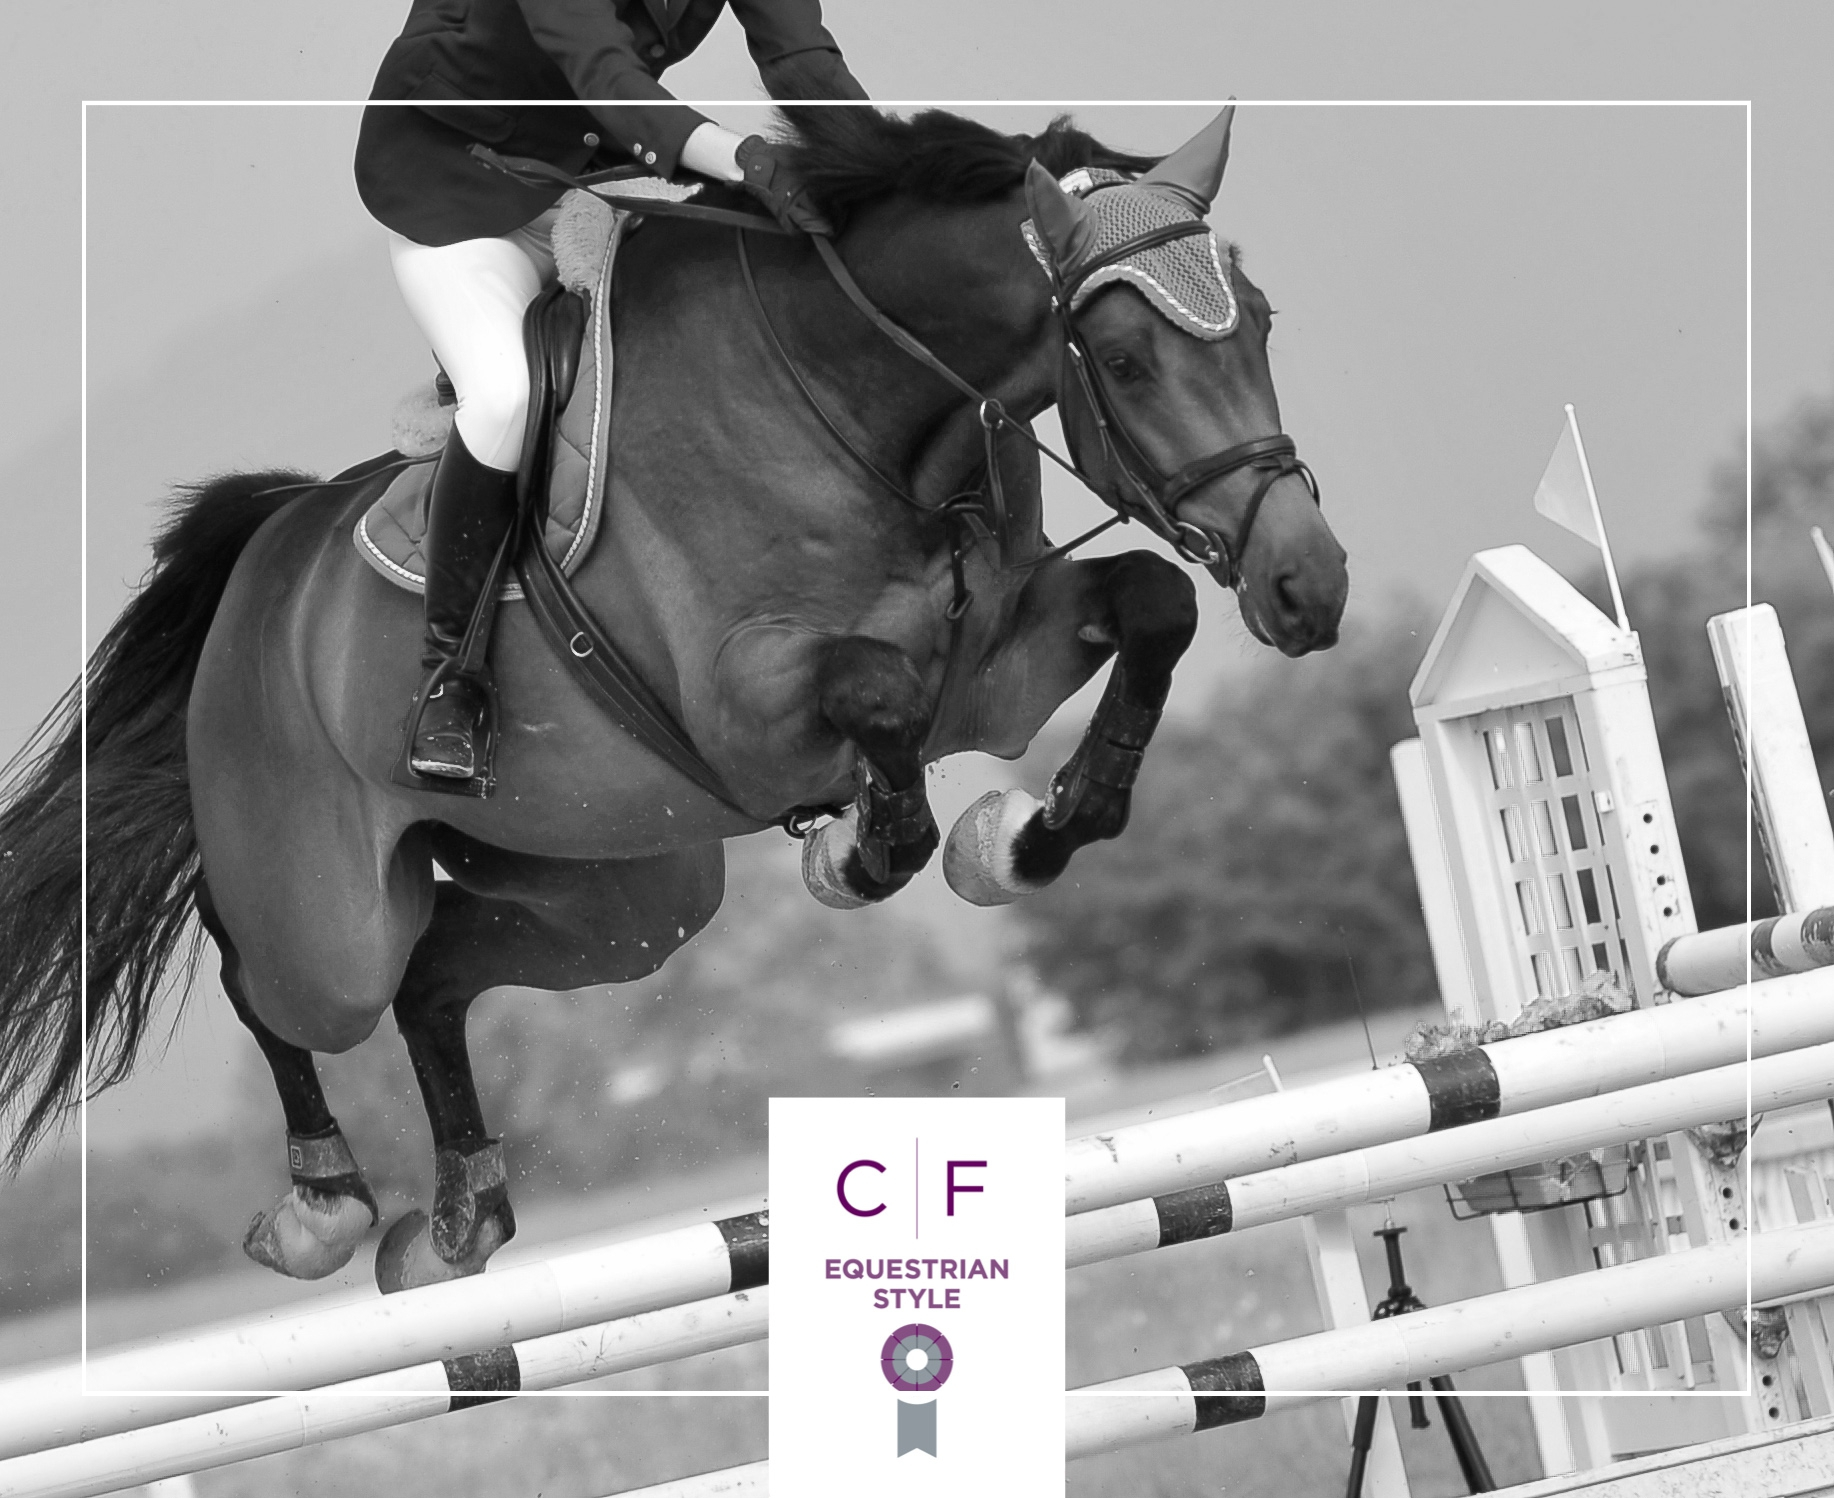 CF Equestrian Style